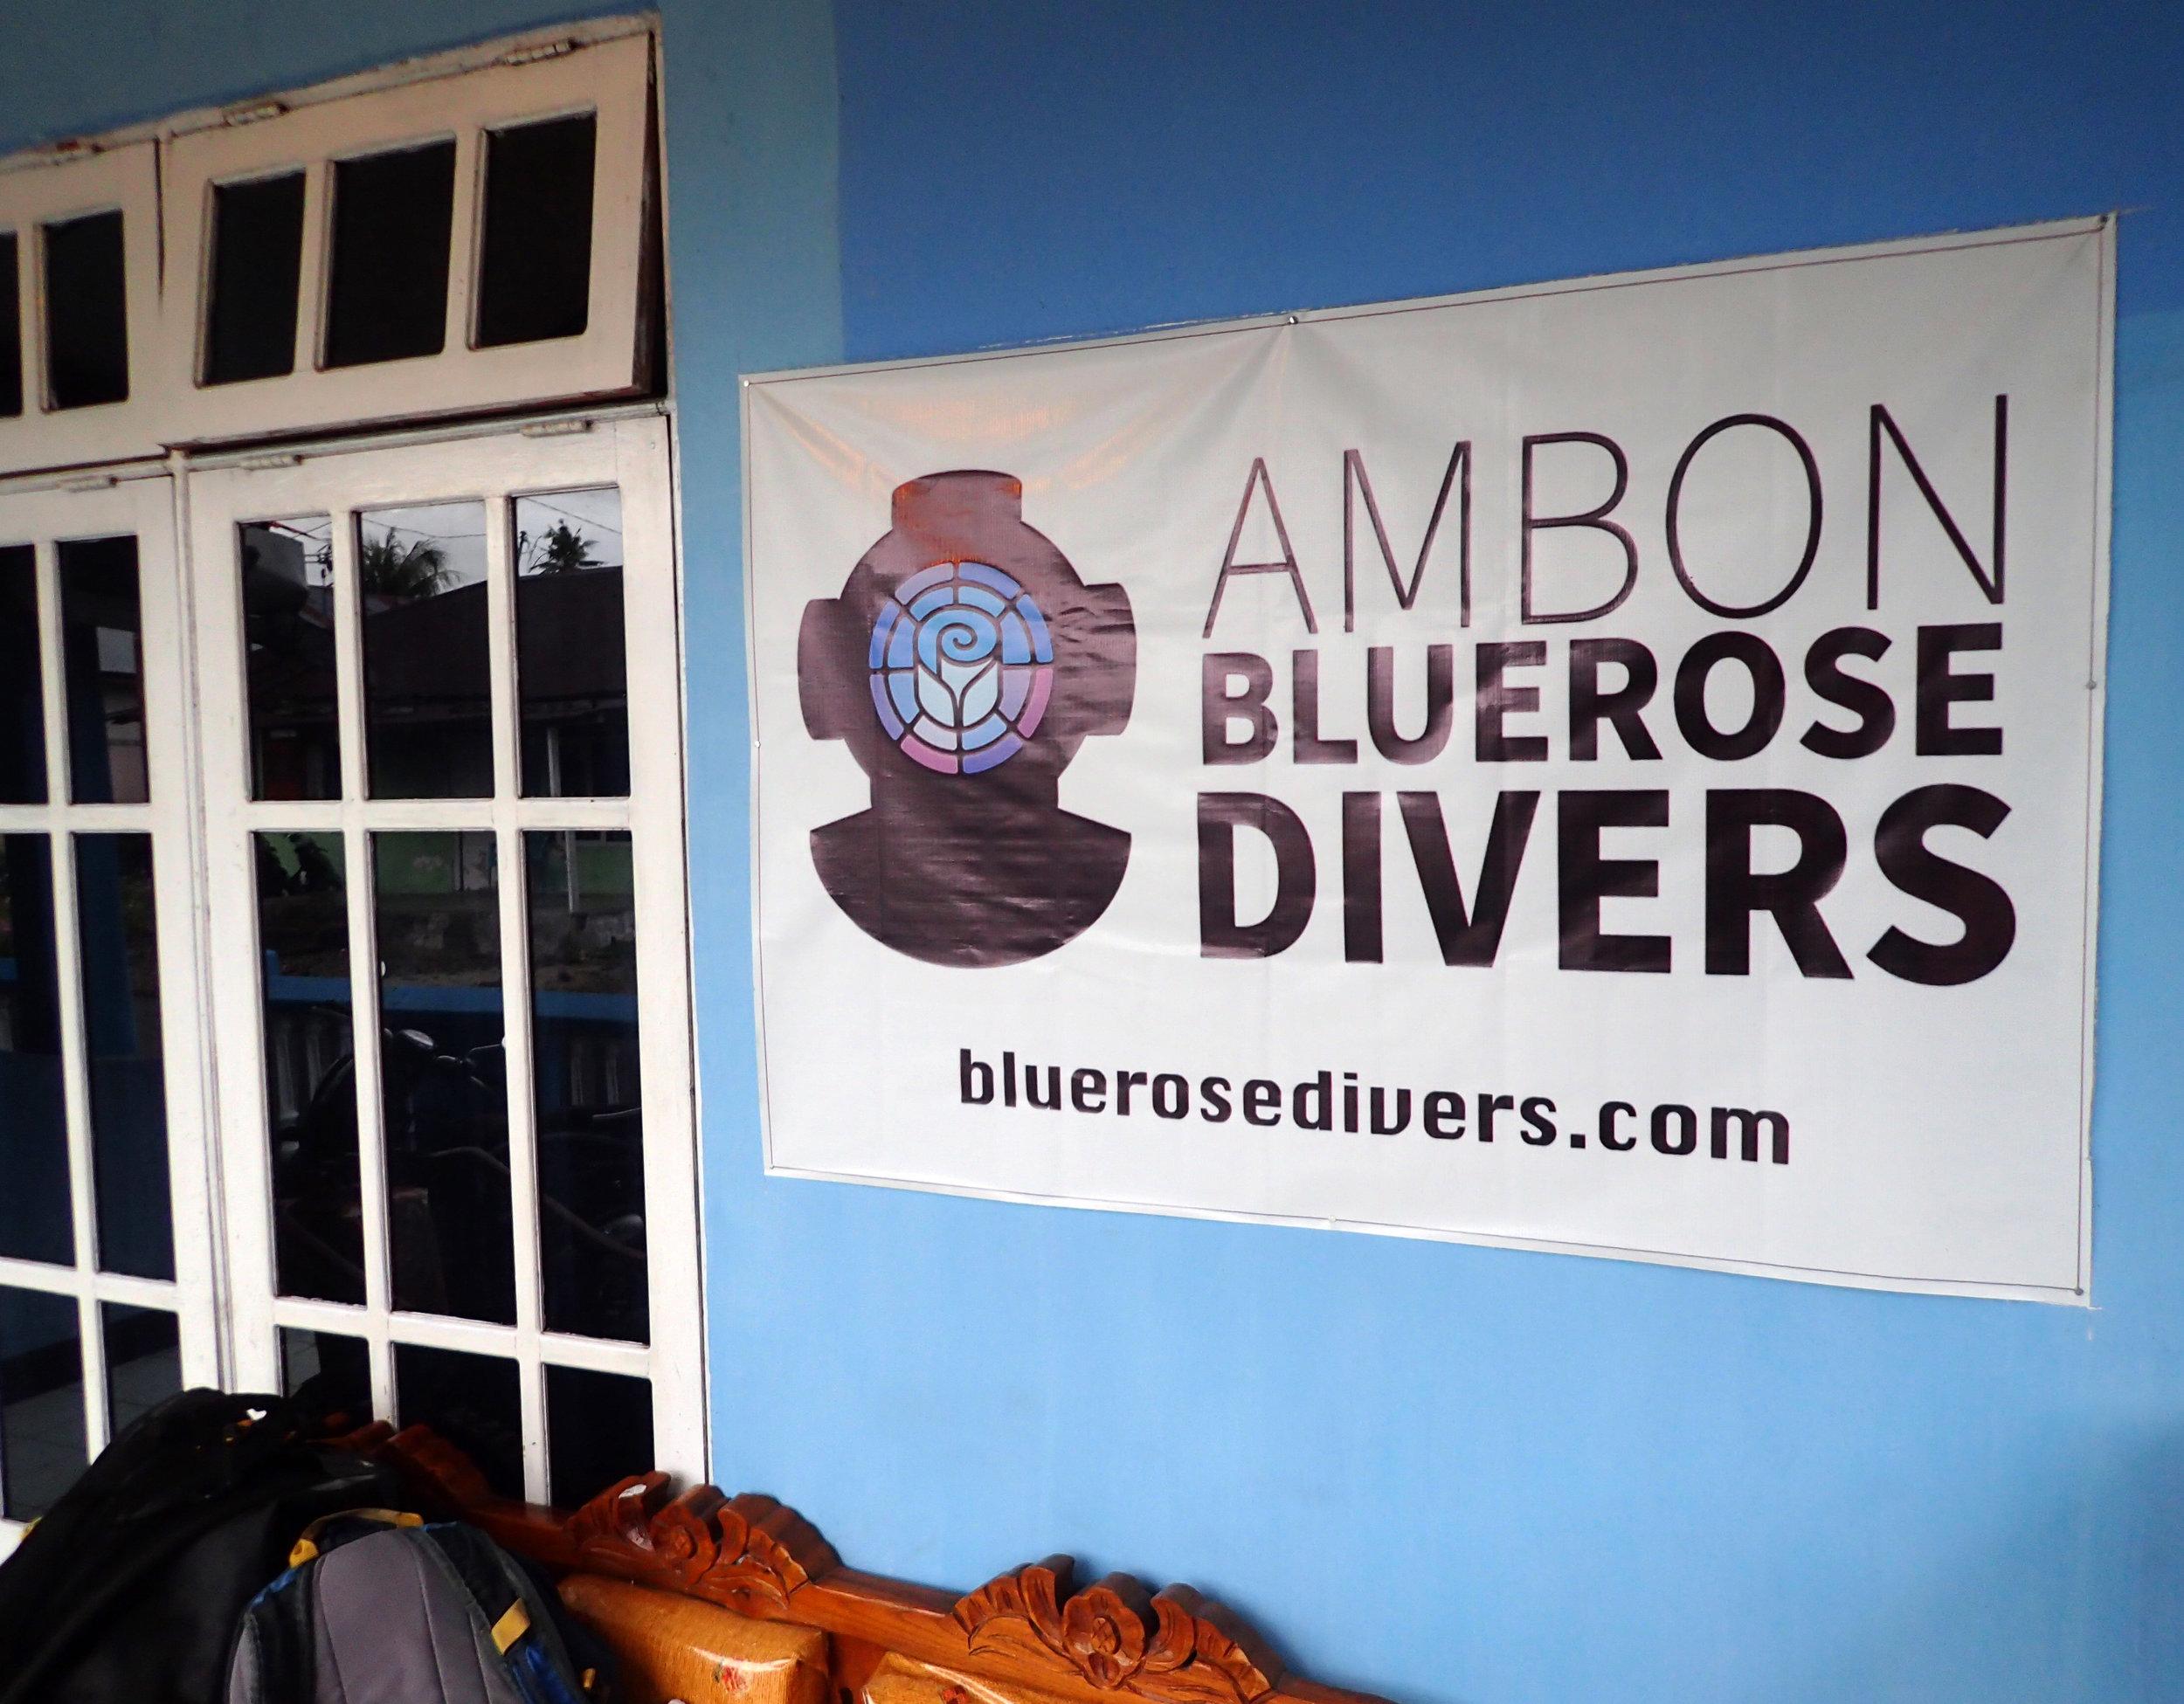 Ambon Blue Rose Divers.jpg